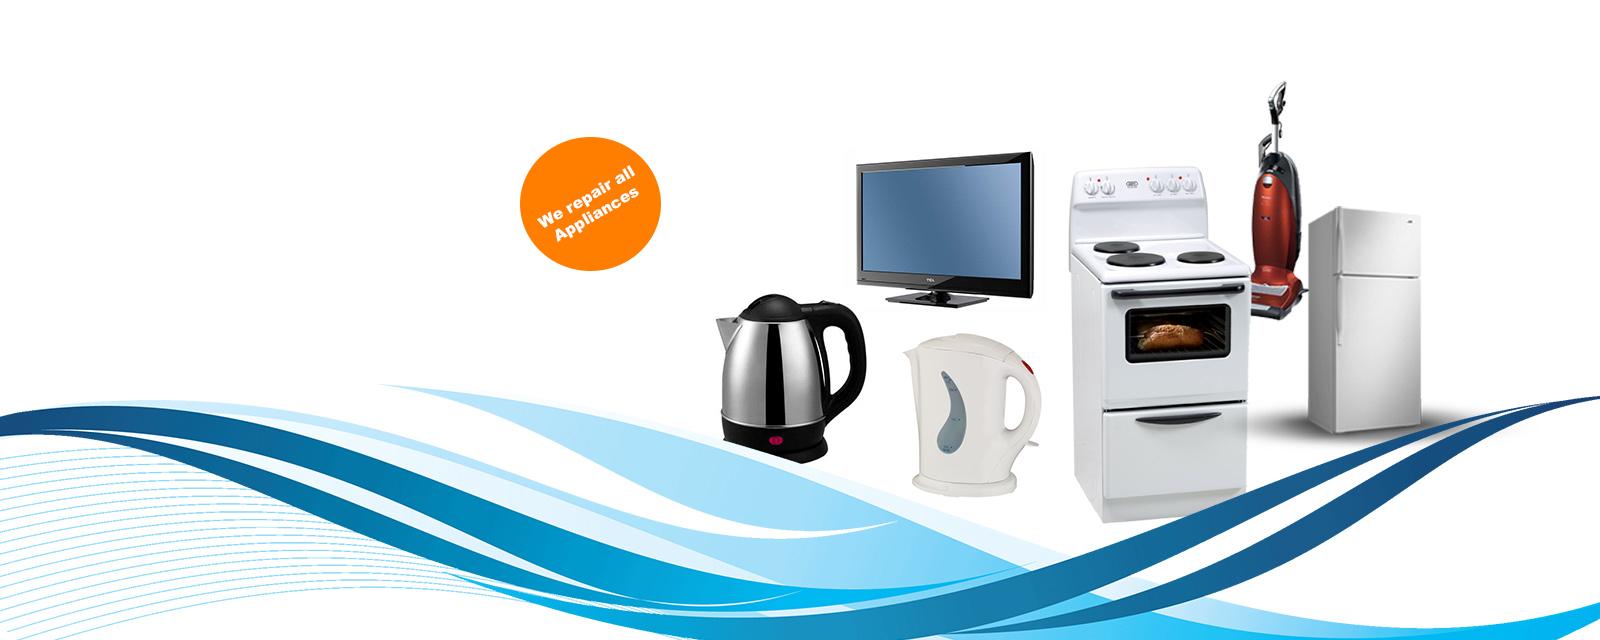 Moshoeu Appliances